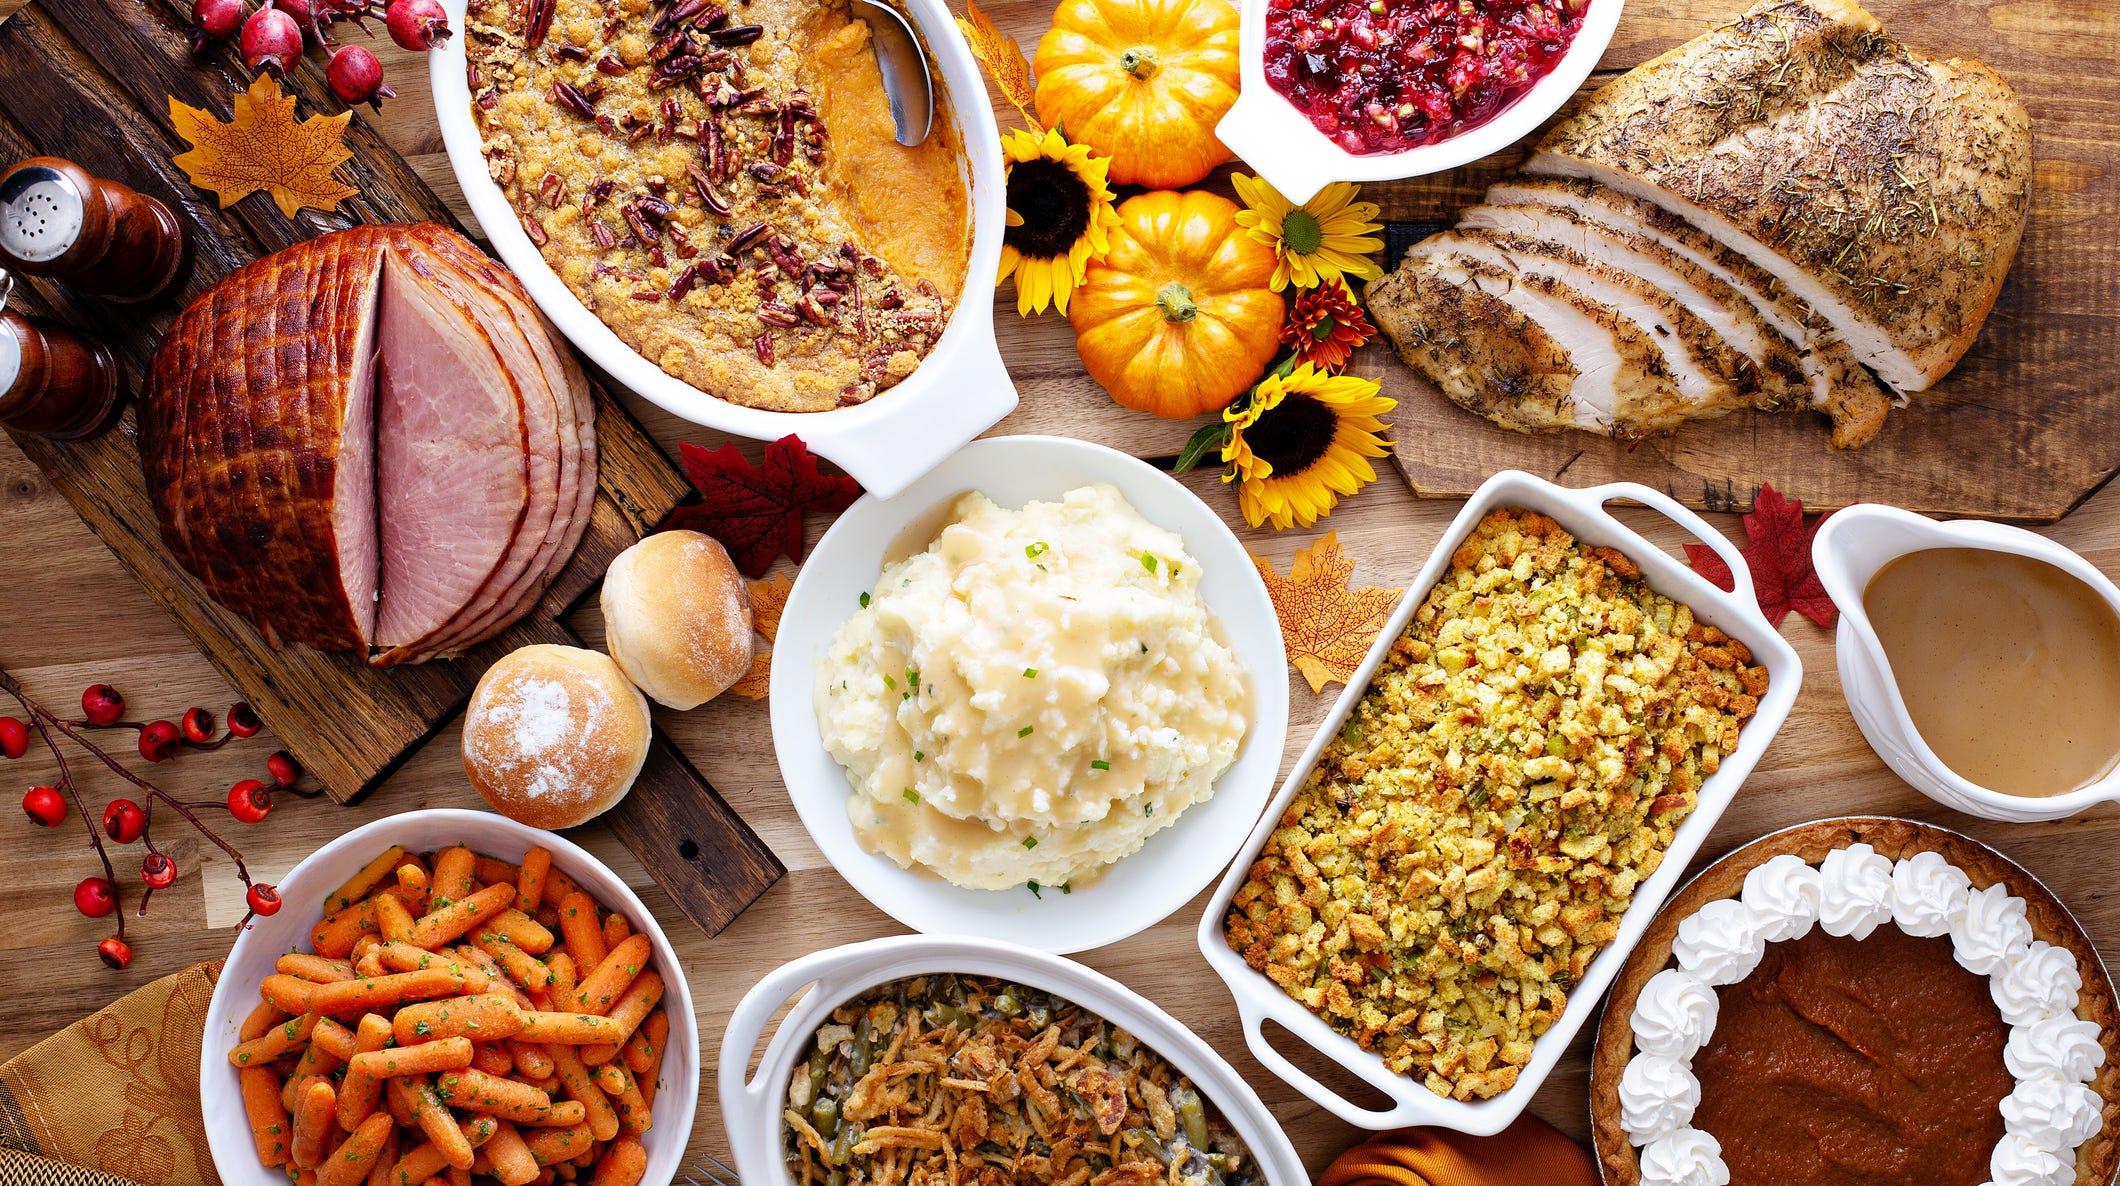 Thanksgiving restaurants open: Applebee's, Cracker Barrel, Starbucks